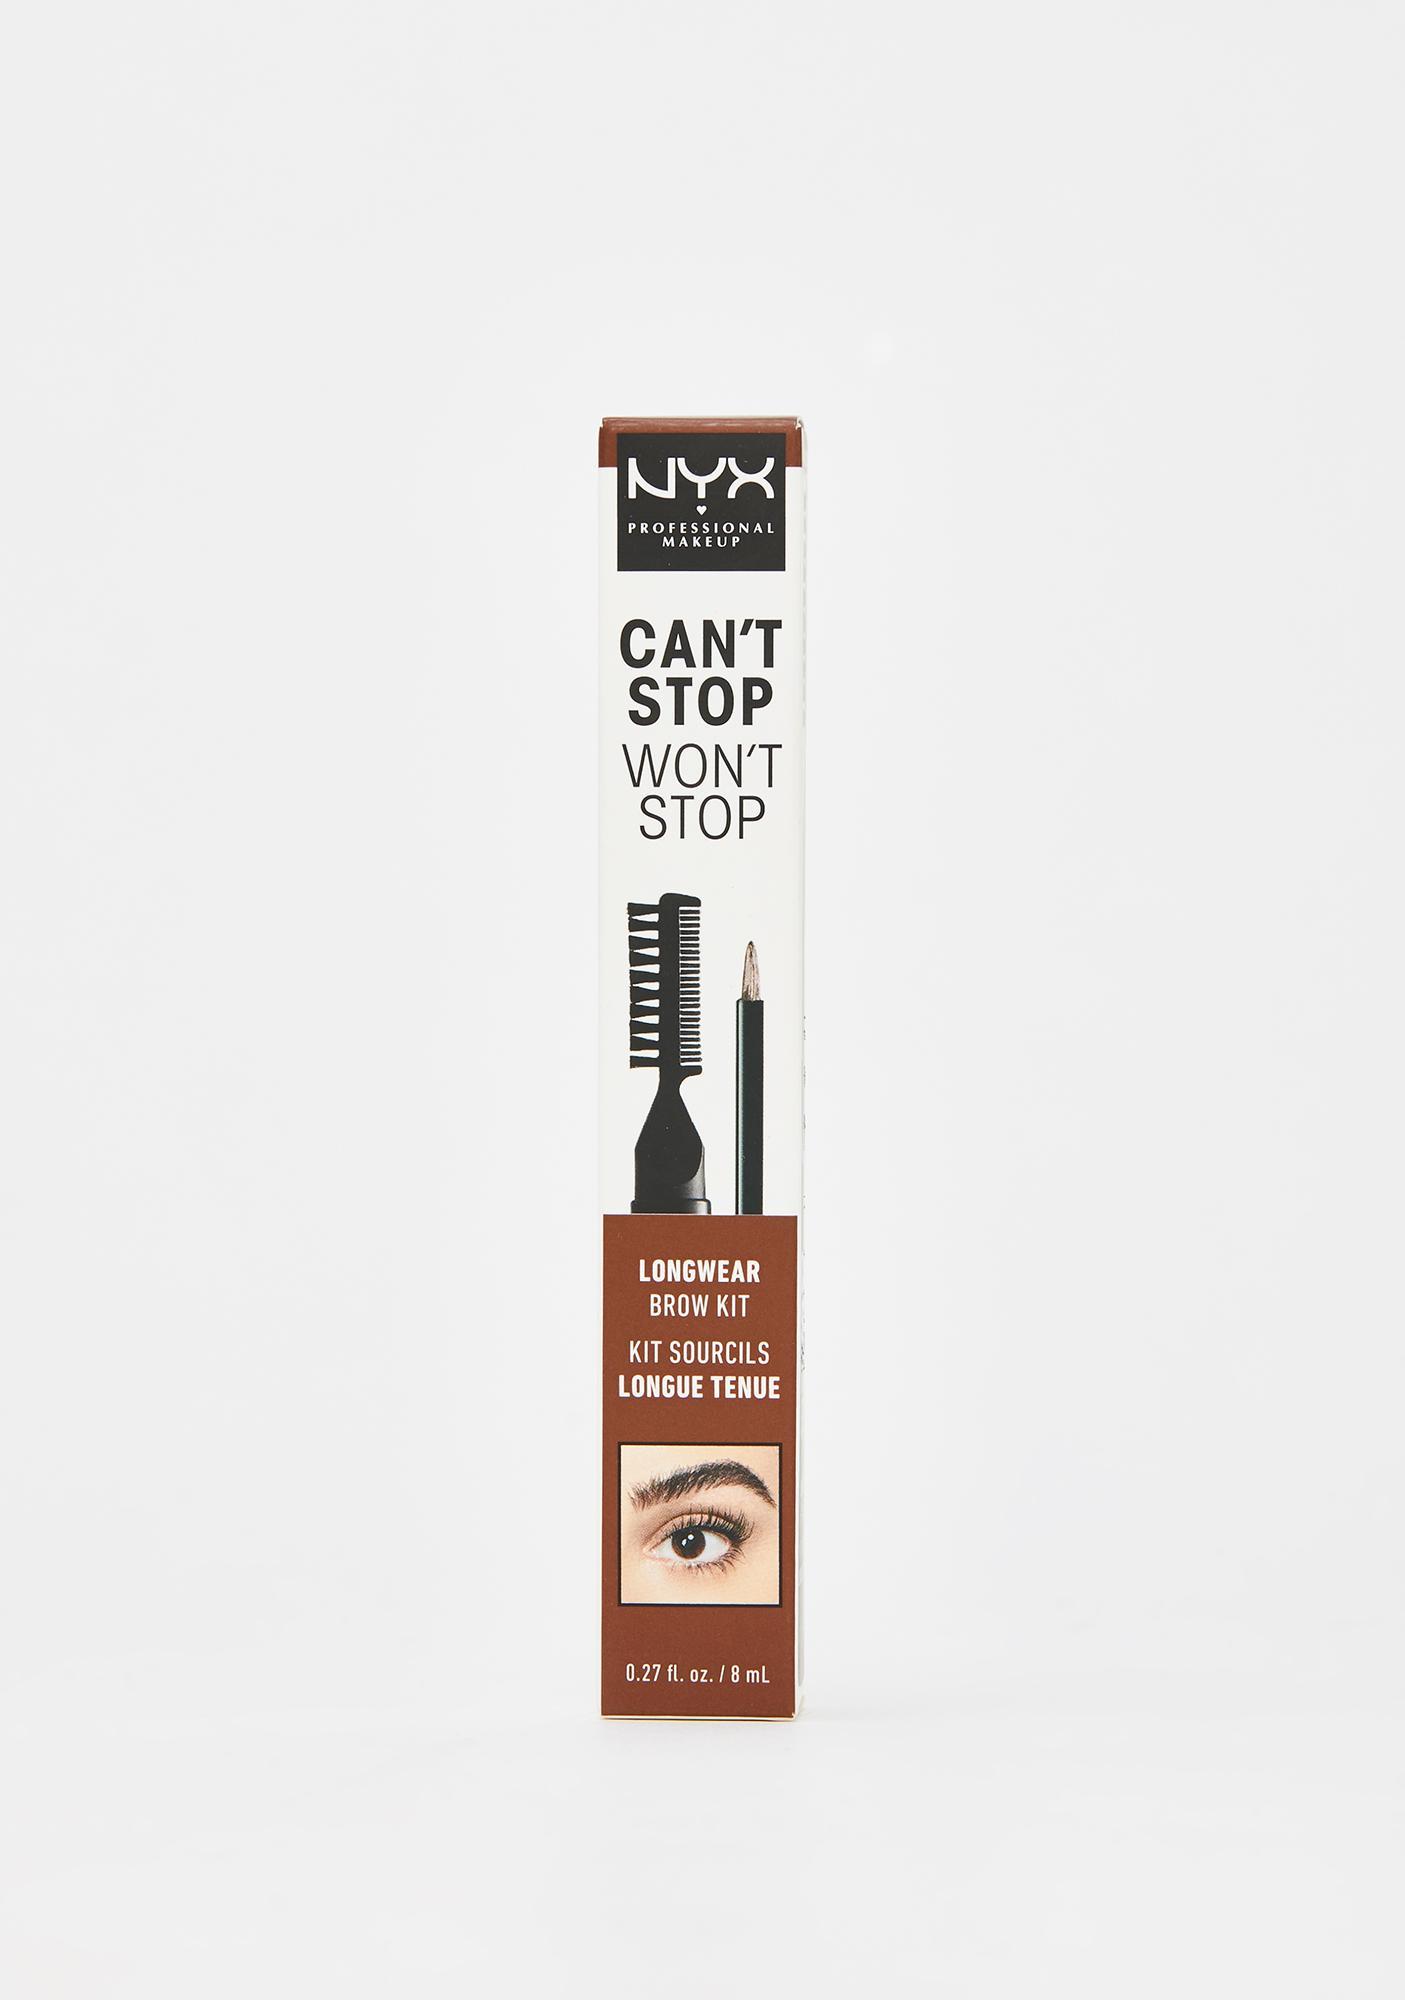 NYX Professional Makeup Brunette Can't Stop Won't Stop Longwear Brow Kit